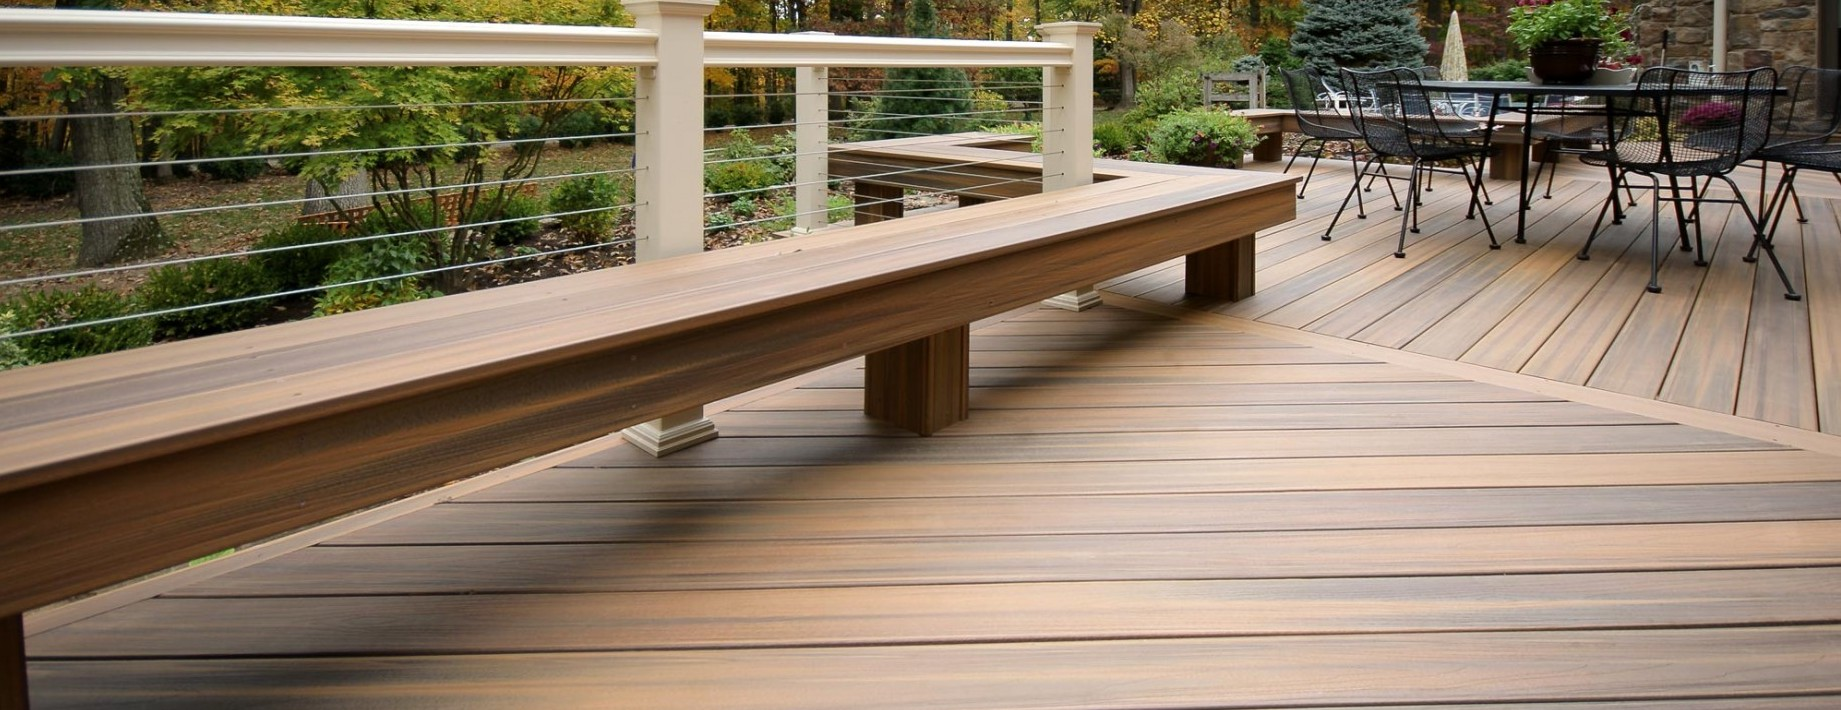 terrasse loire eco bois. Black Bedroom Furniture Sets. Home Design Ideas